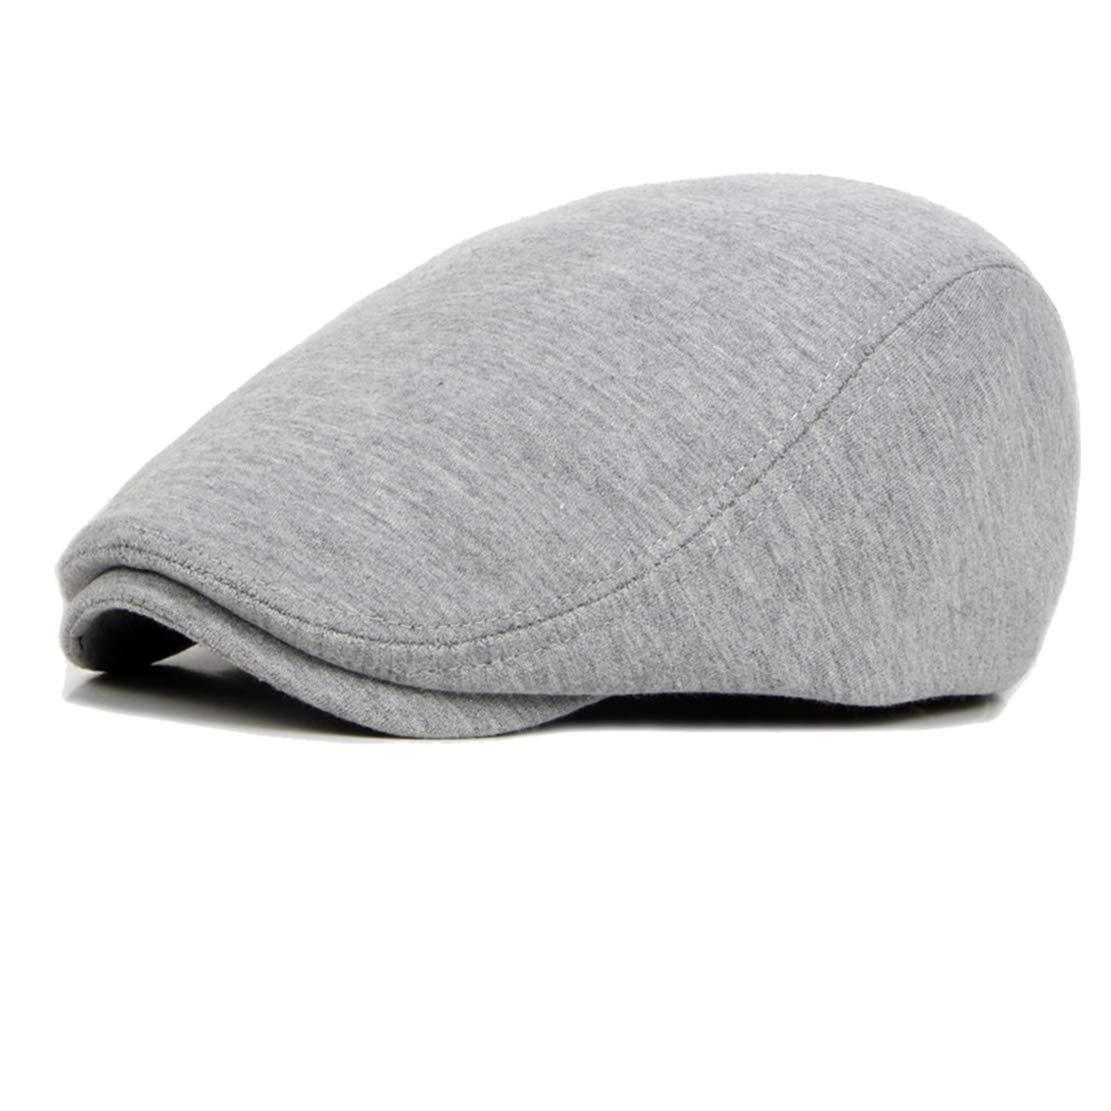 Eohak Mens Cotton Flat Cap Driving Hat Cabbie Newsboy C